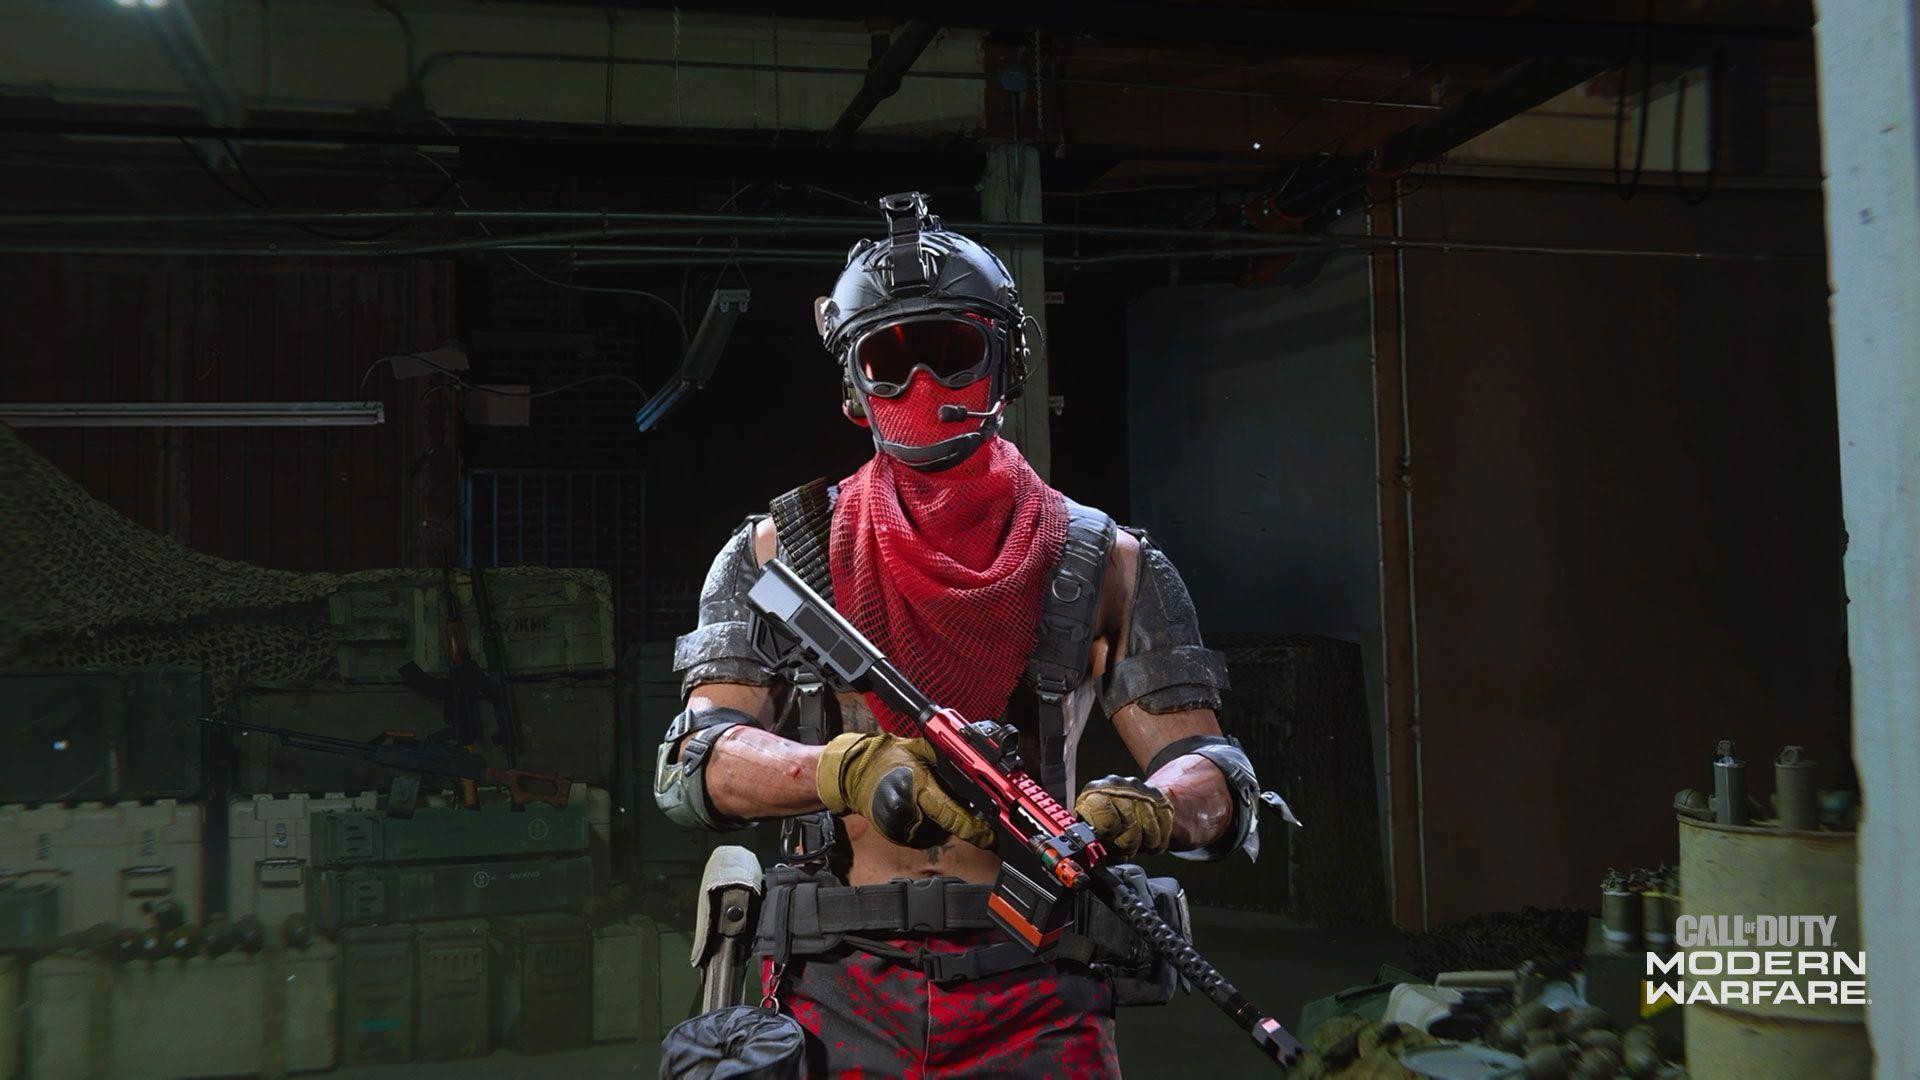 Call of Duty Modern Warfare Warzone Infinity Ward